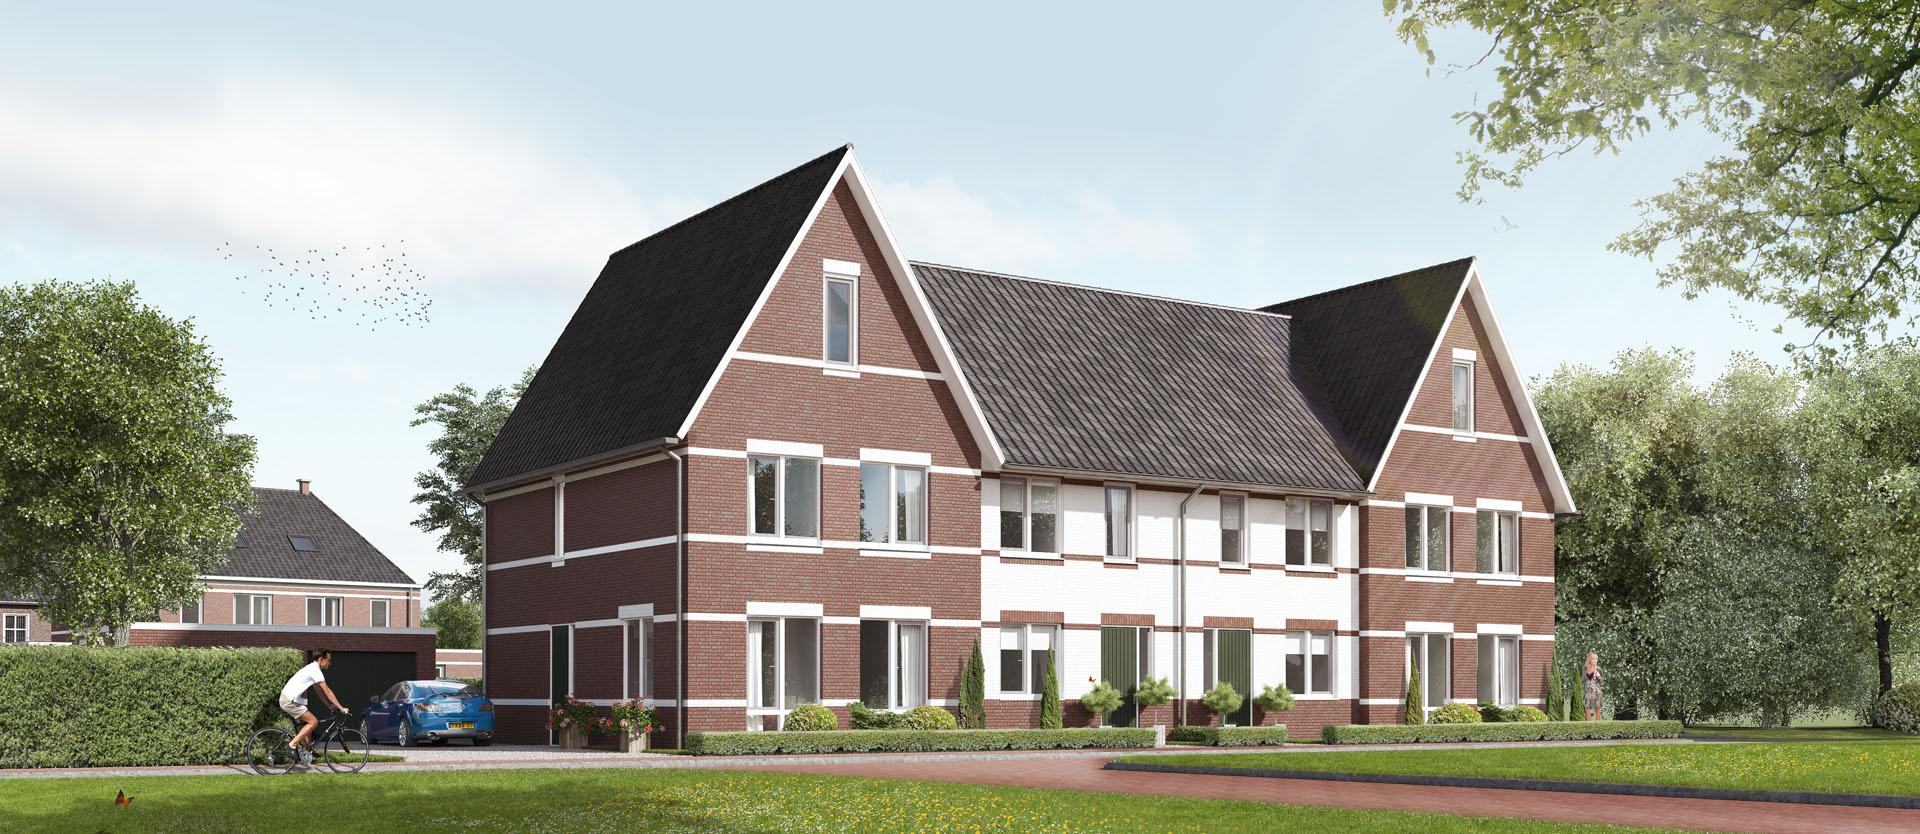 Project Hoge Hoek Florence in Berkel-Enschot